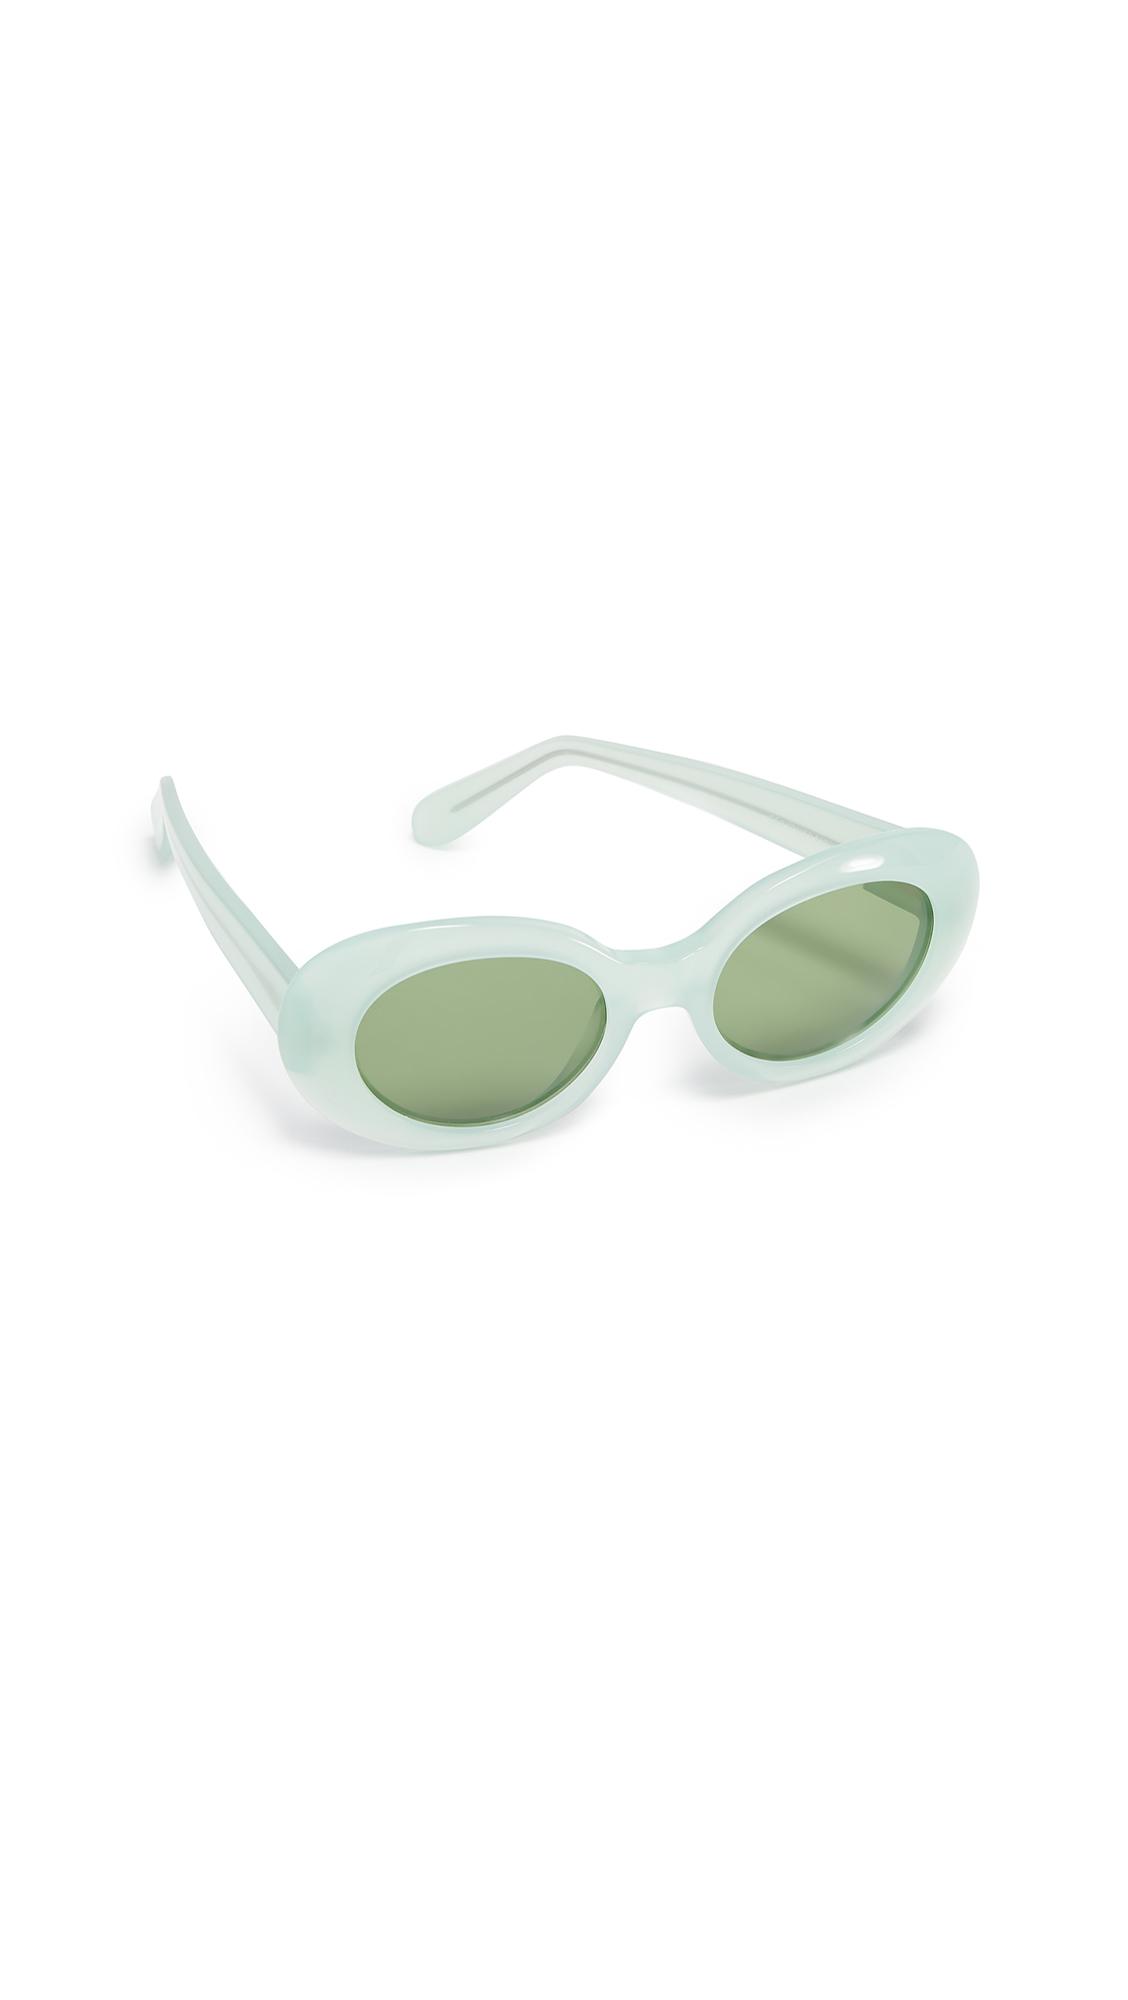 Acne Studios Mustang Sunglasses - Green/Green